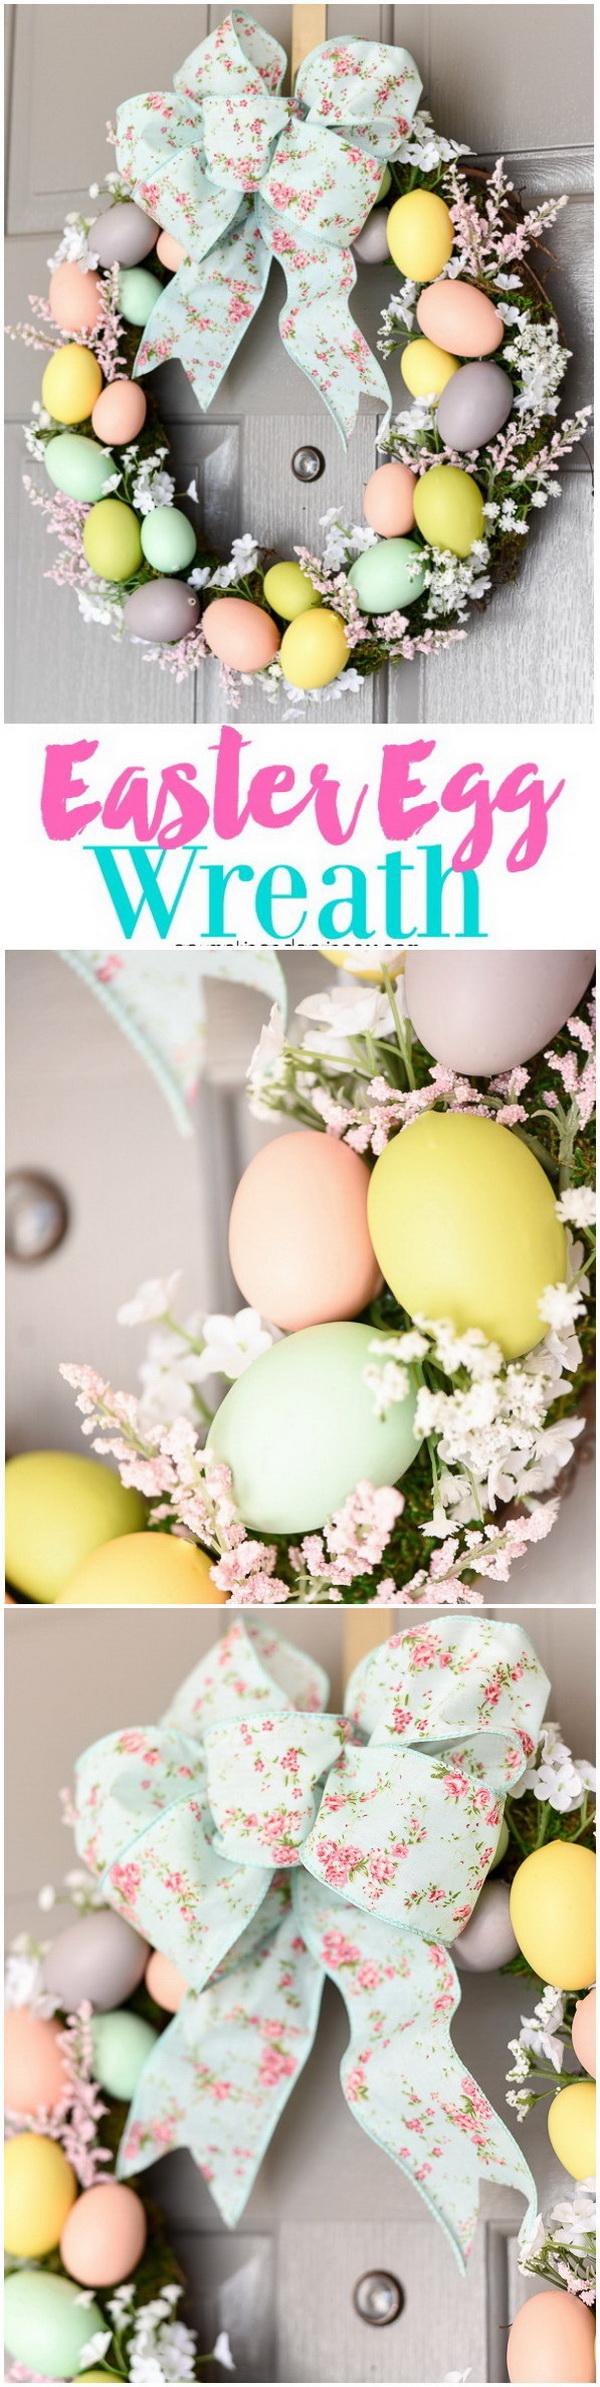 DIY Easter Wreath Ideas: DIY Easter Egg Wreath.